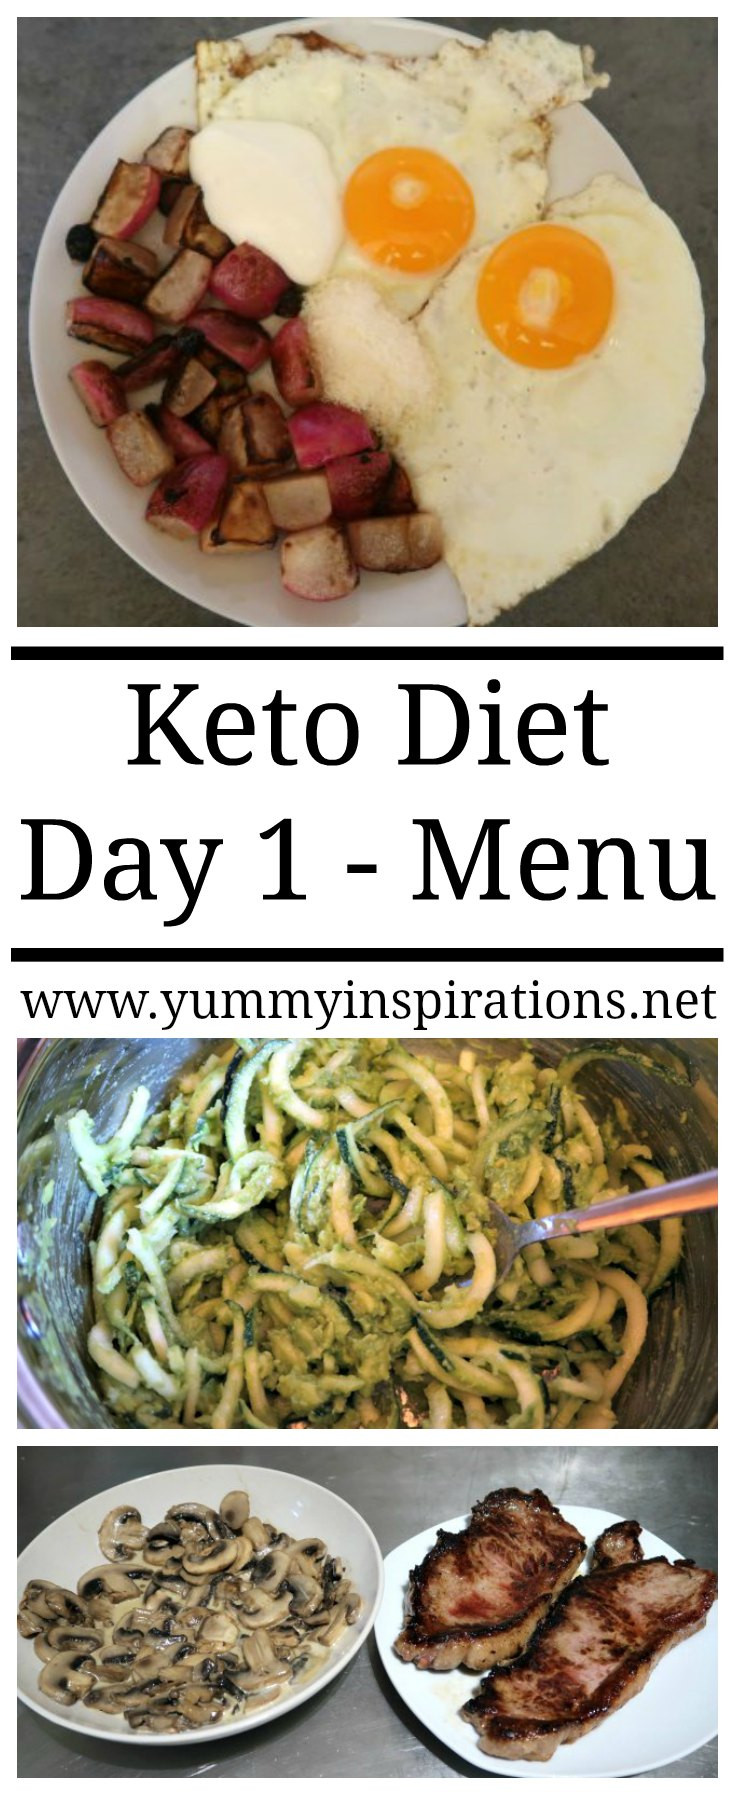 Menu For Keto Diet  Keto Day 1 Meal Plan Menu & Video Diary Day e